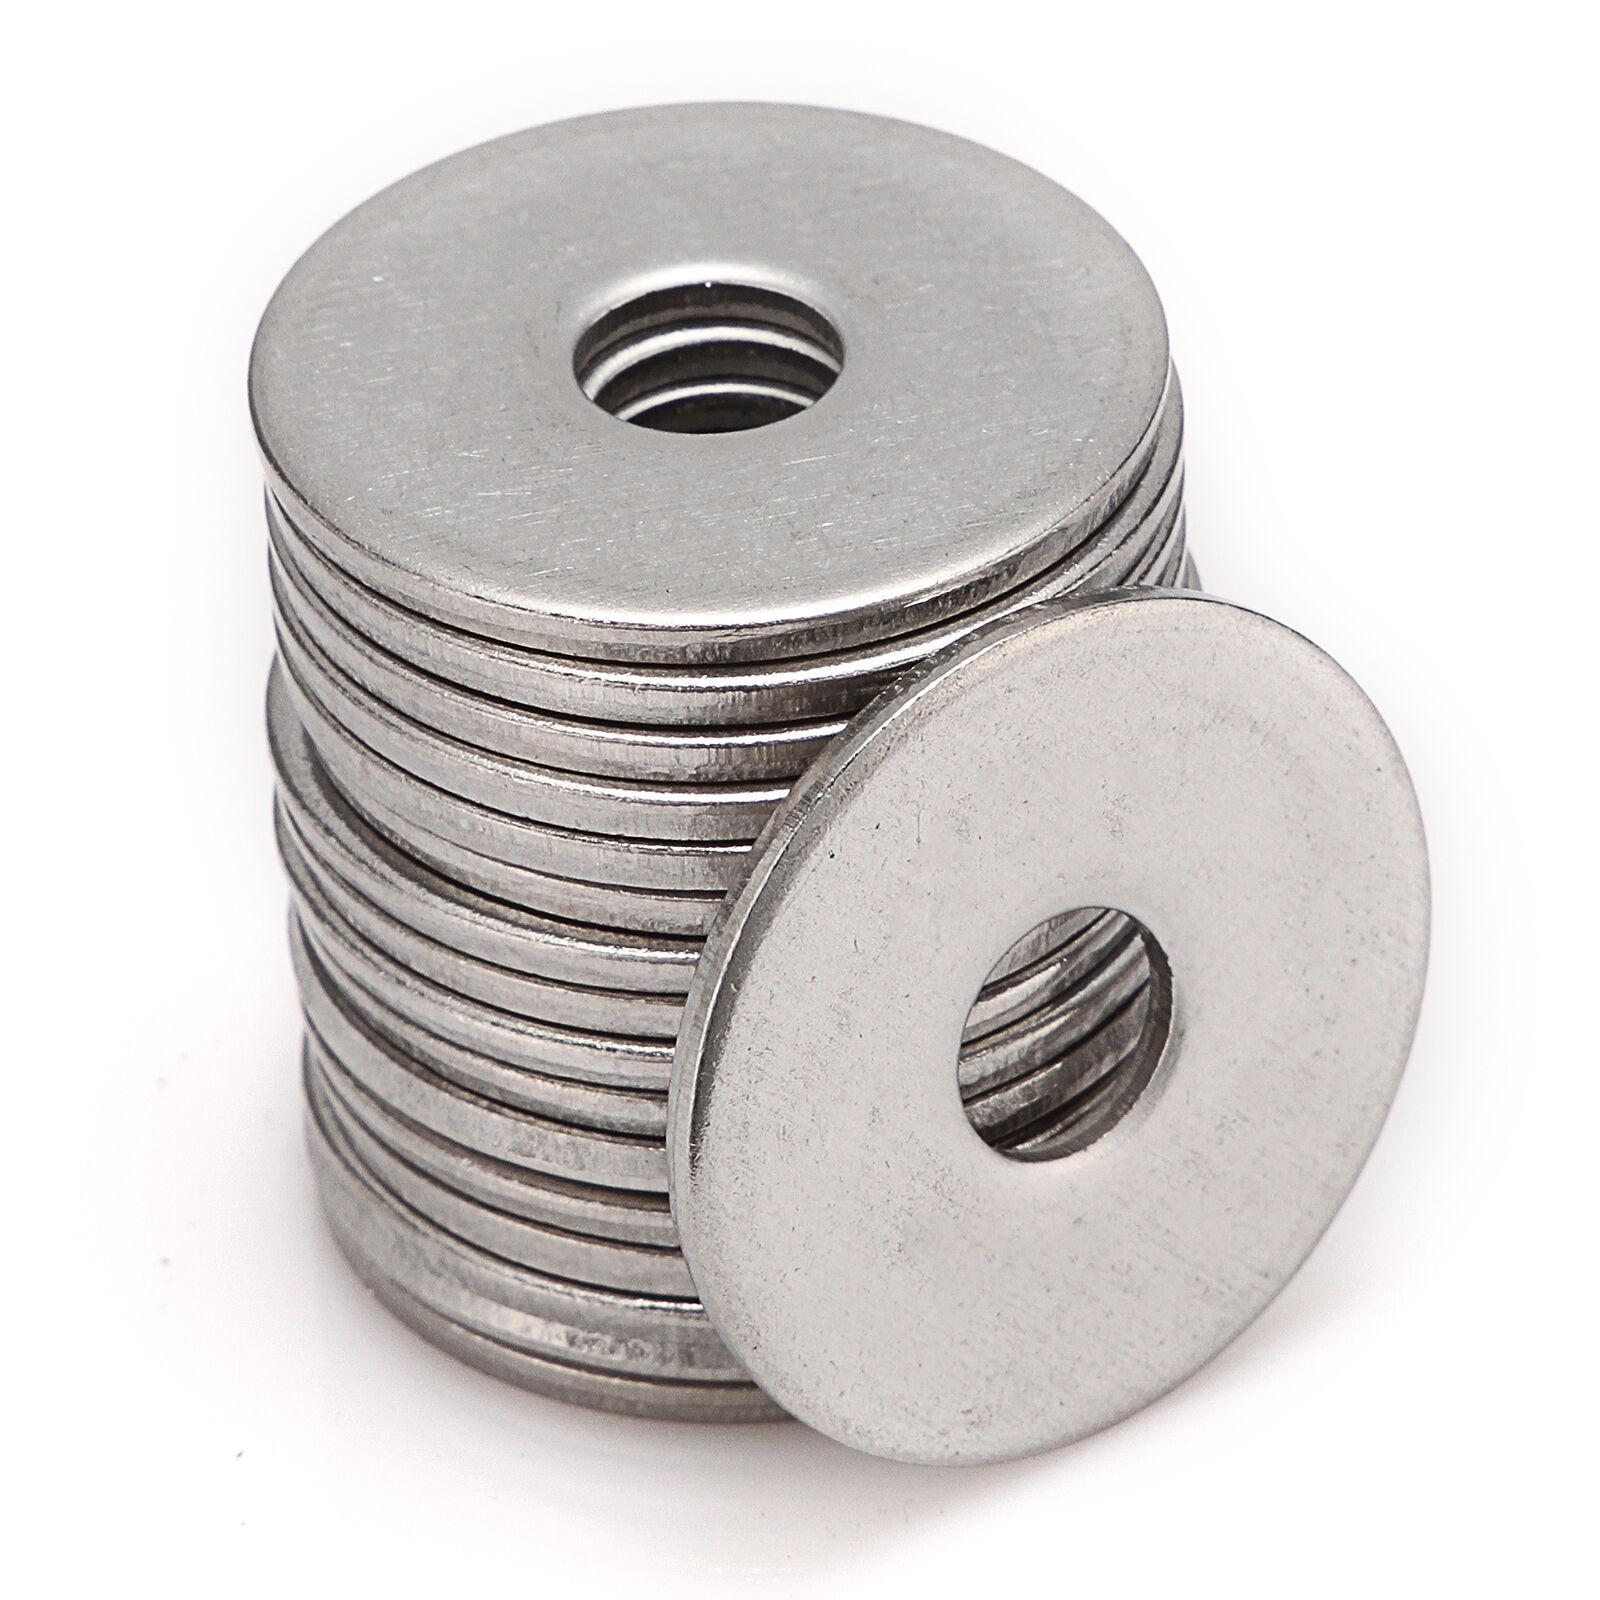 M3 M4 M5 M6 M8 M10 M12 M14 M16 M20 A2 Stainless Steel Penny Repair Flat Washers 2